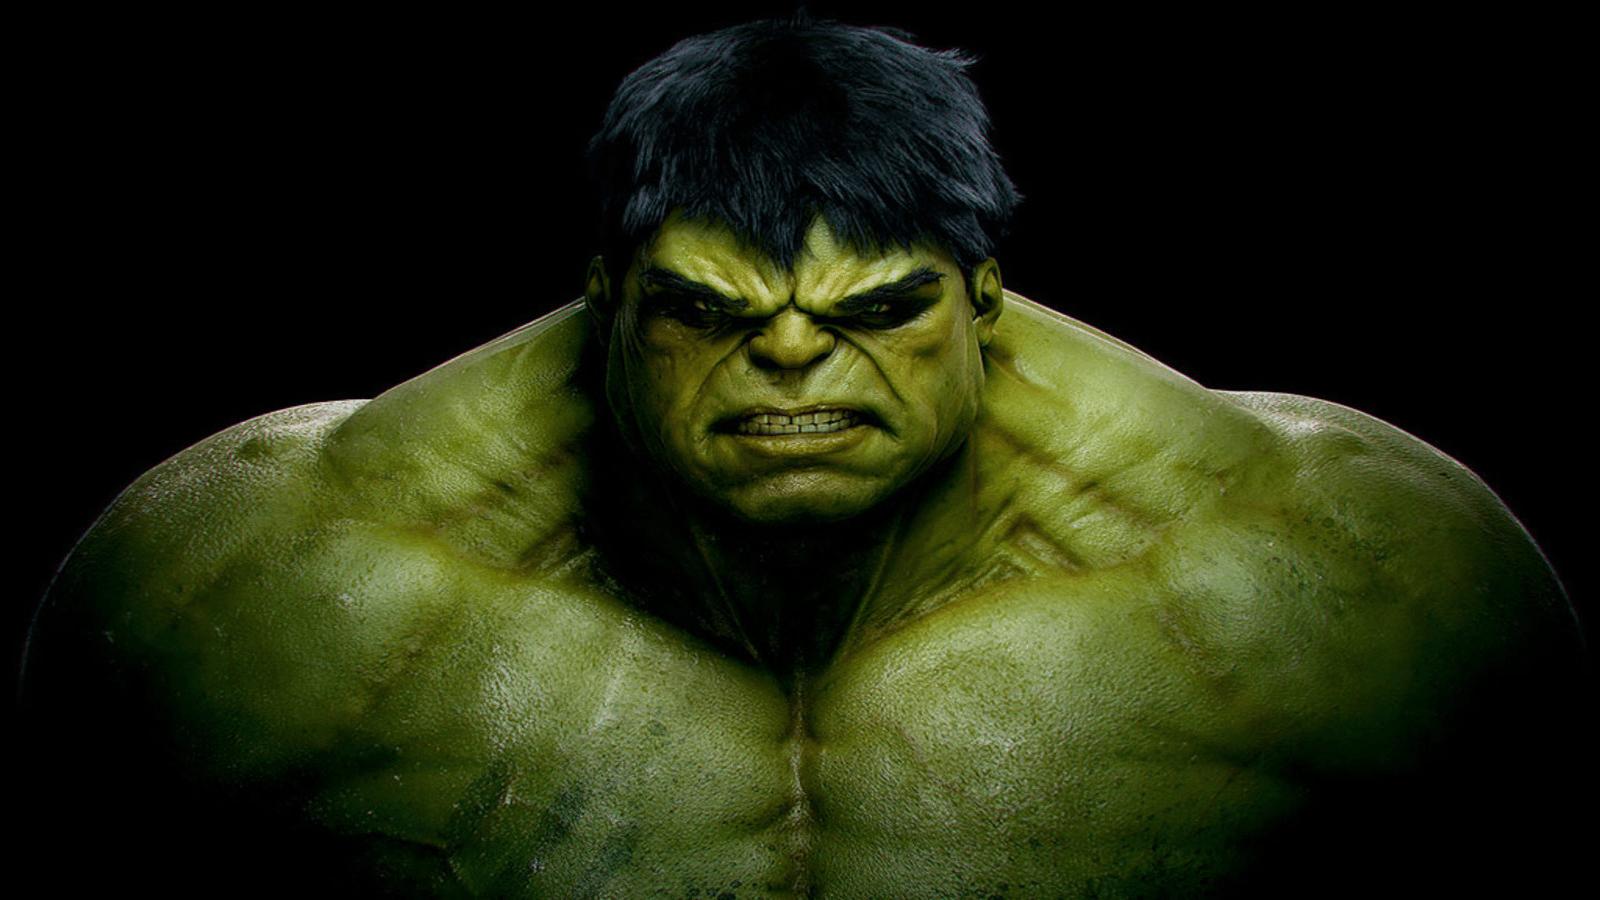 ULtra HD 4K 8K Fine Hulk Man Download HD DesktopMobile Wallpaper 1600x900